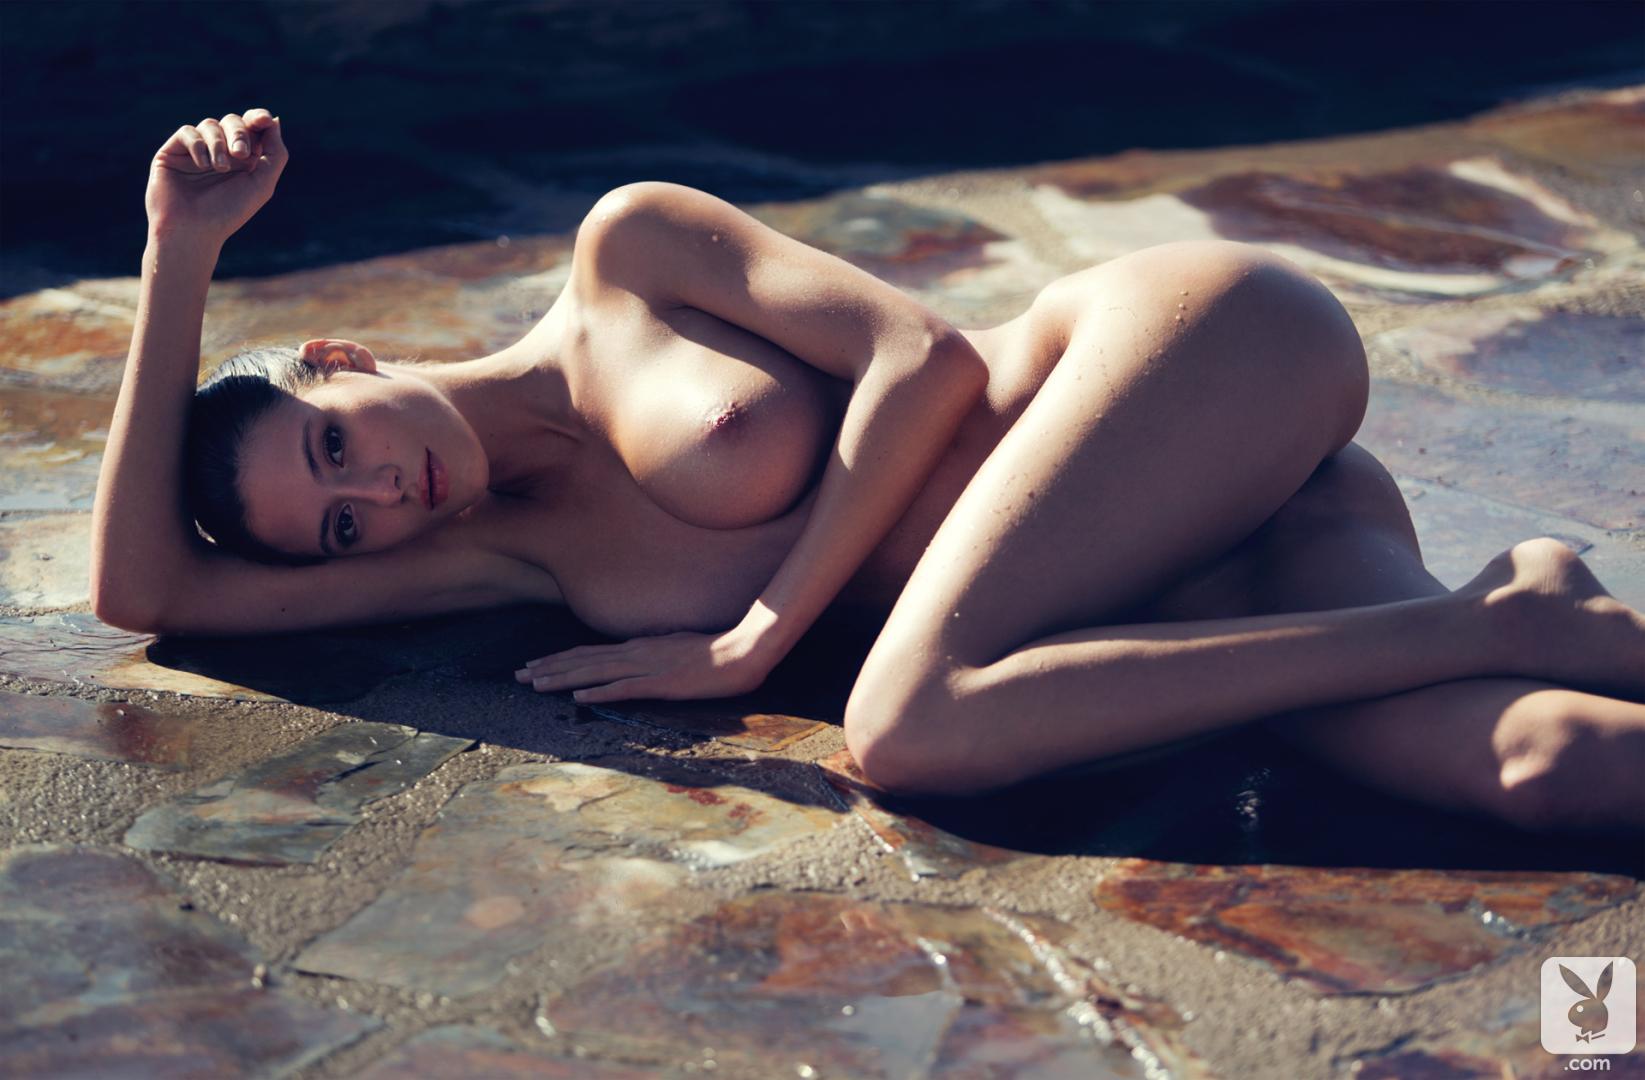 from Tomas boy girl sensual nude pics